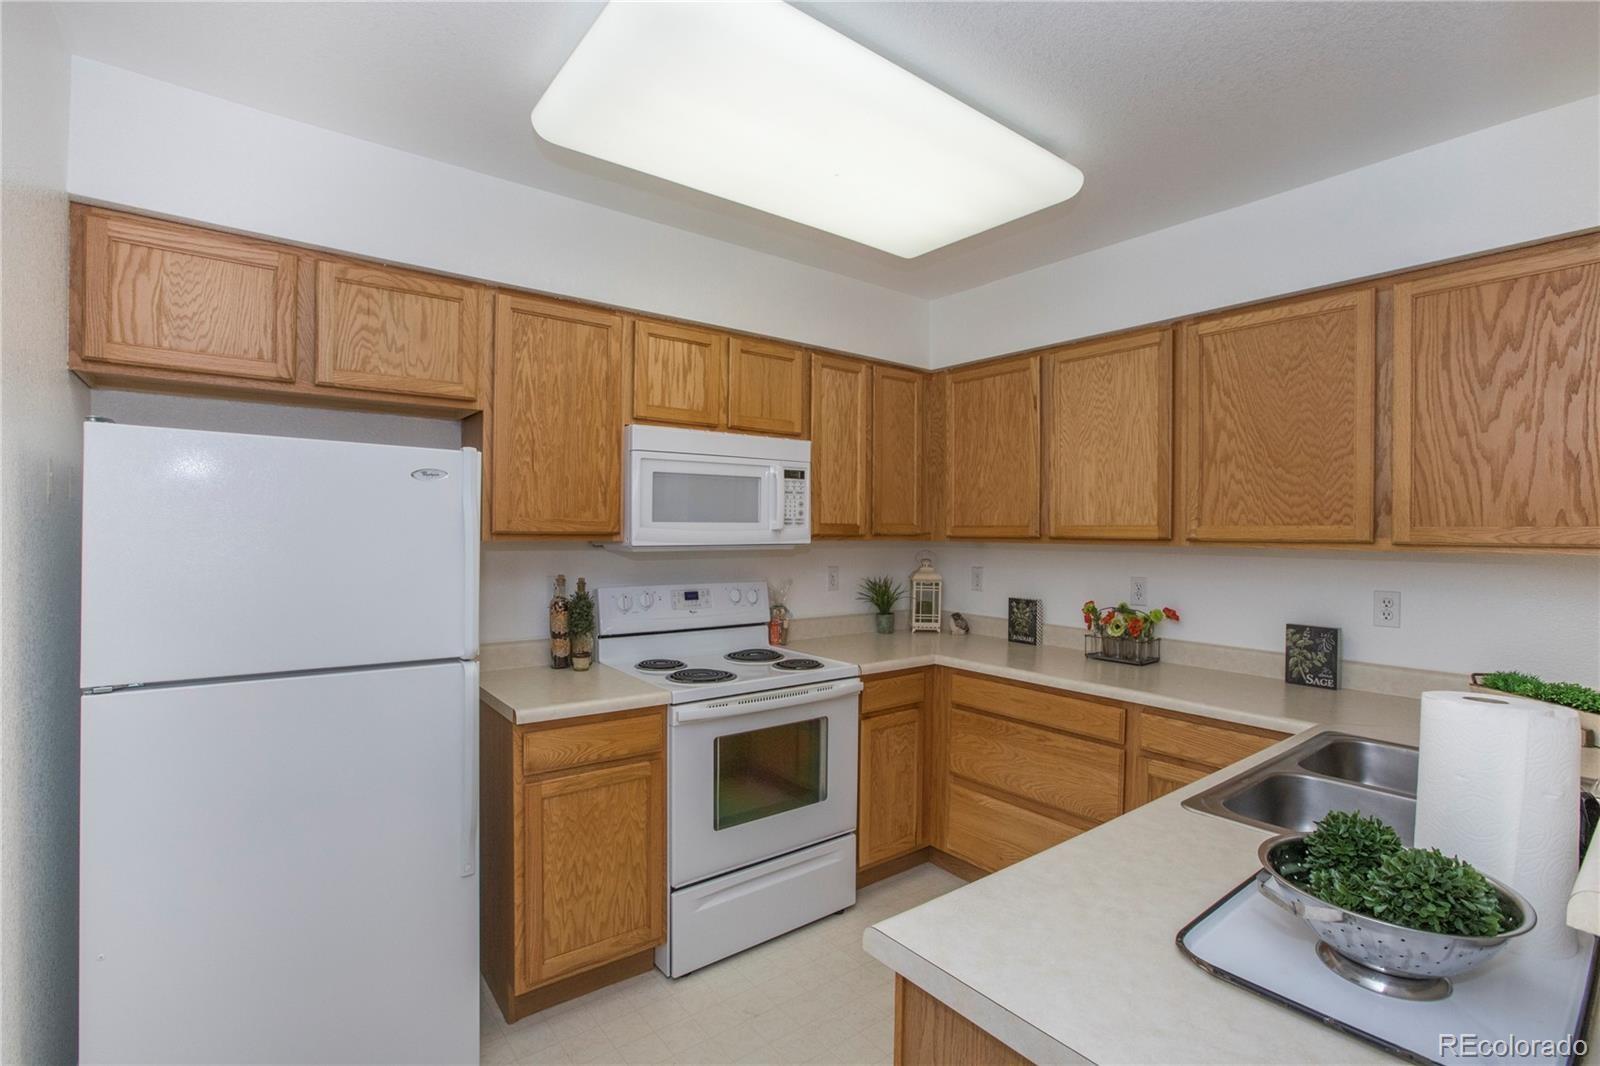 MLS# 3758449 - 14 - 6802 Antigua Drive #26, Fort Collins, CO 80525